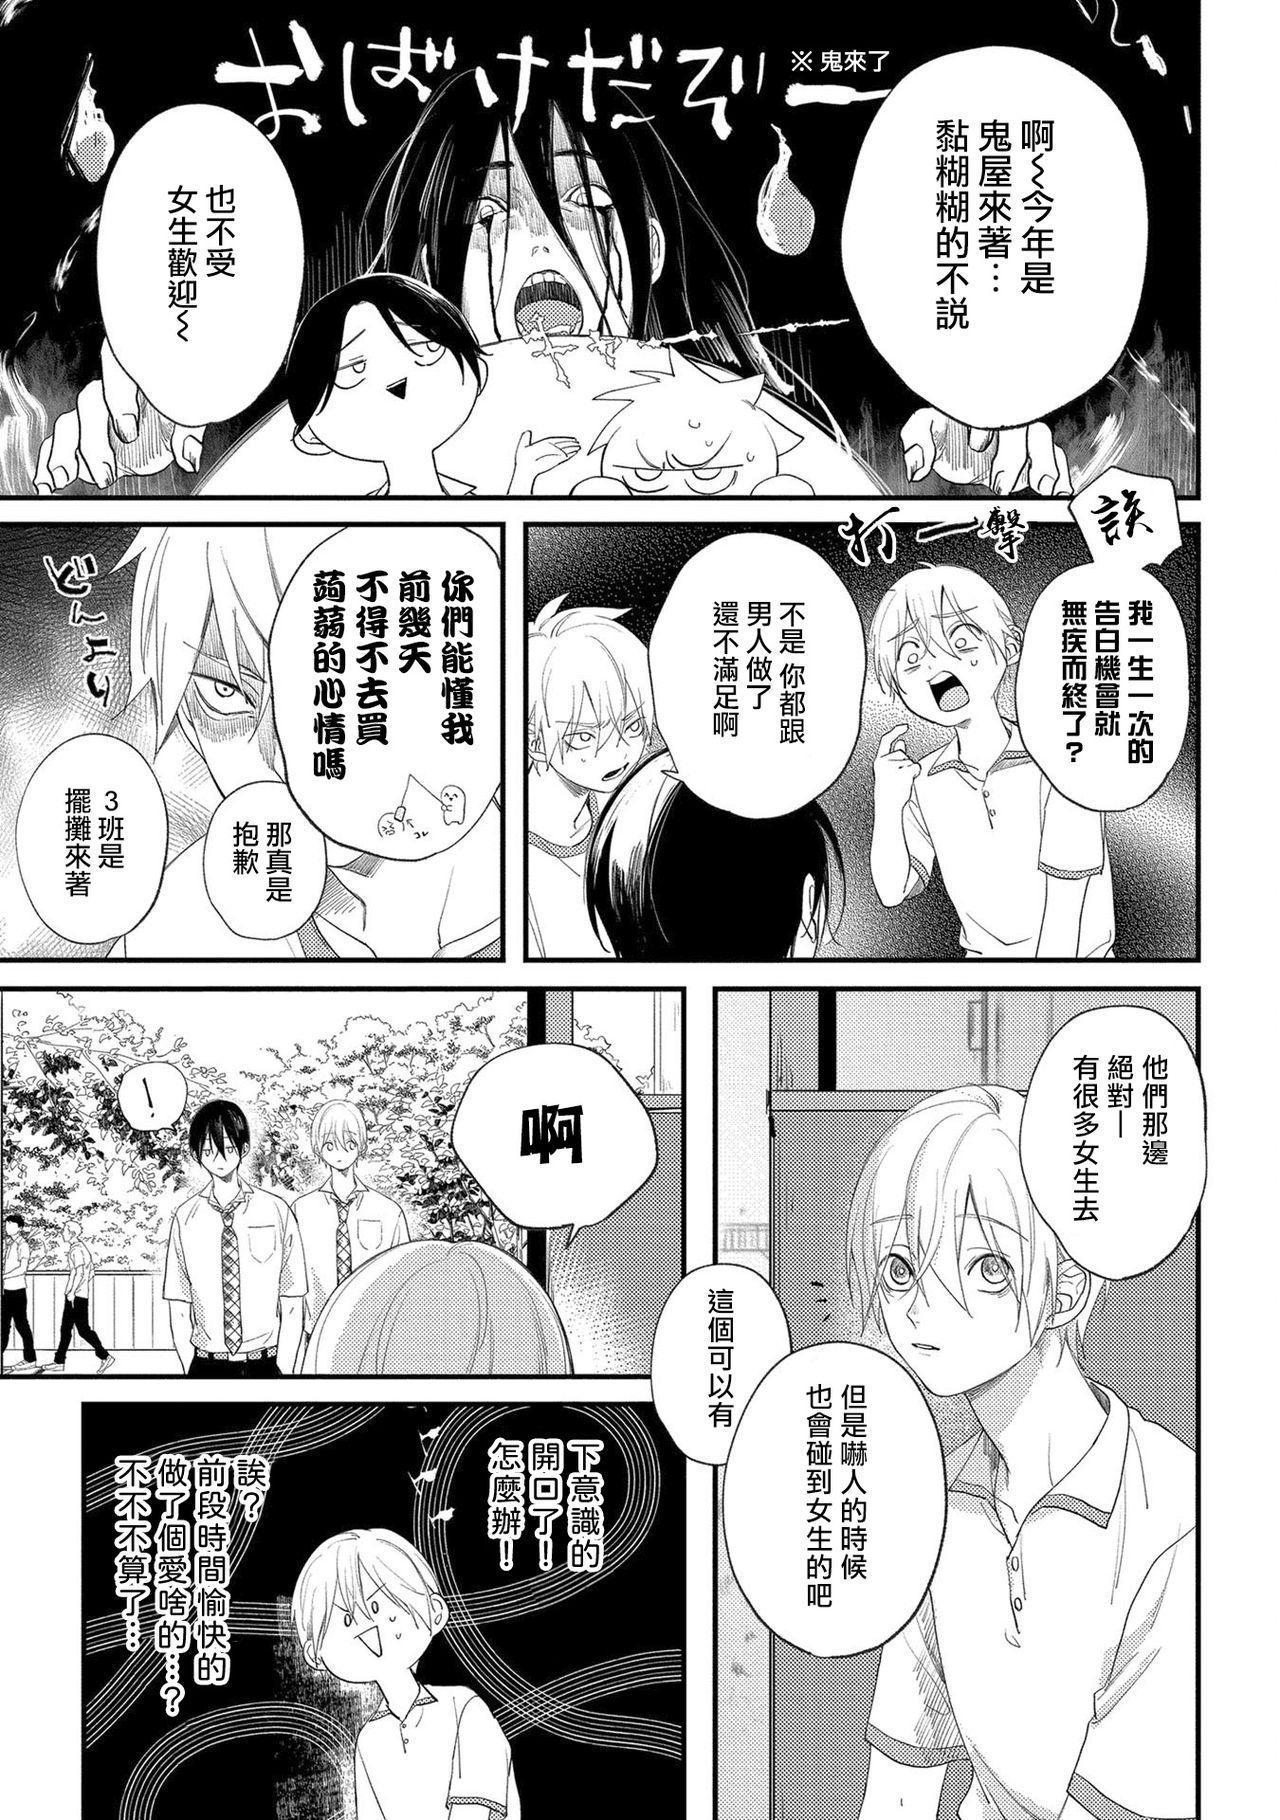 [Utata Hakuto] Houkago Virginity - Virginity afterschool 1-5 完结 [Chinese] [拾荒者汉化组] [Digital] 37